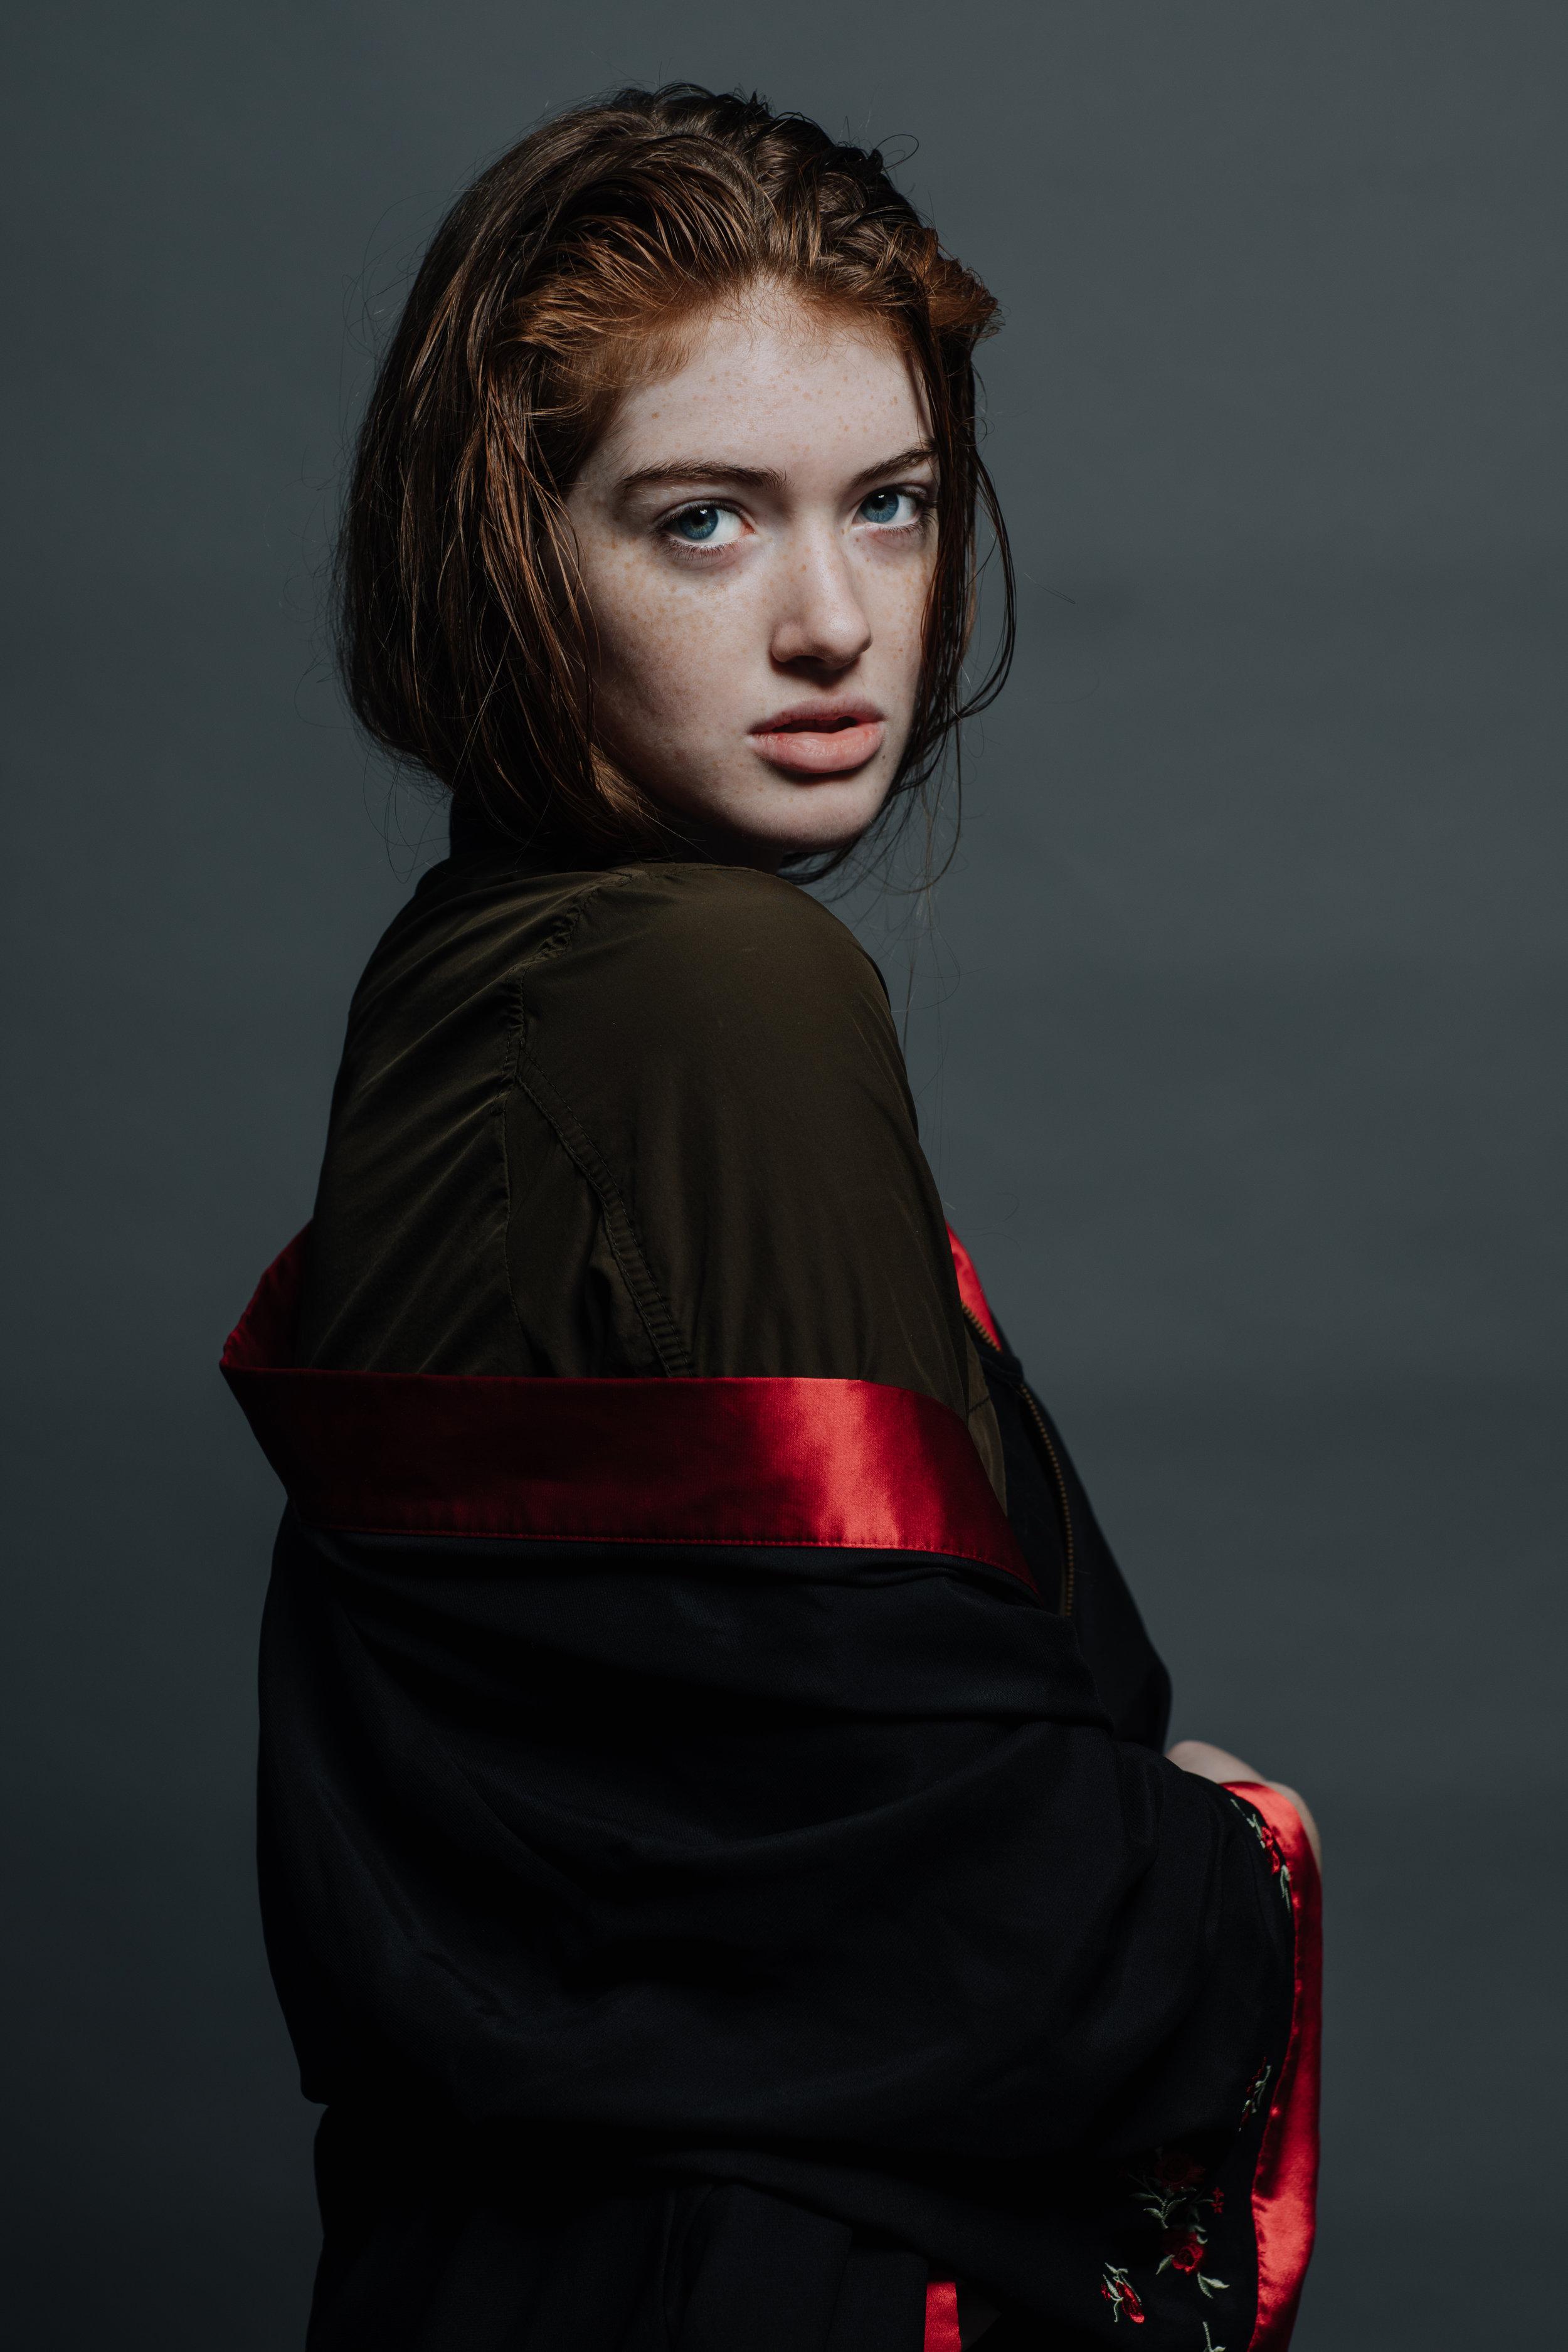 Paige-Newton-Model-Test-Eva-Malone-020.jpg